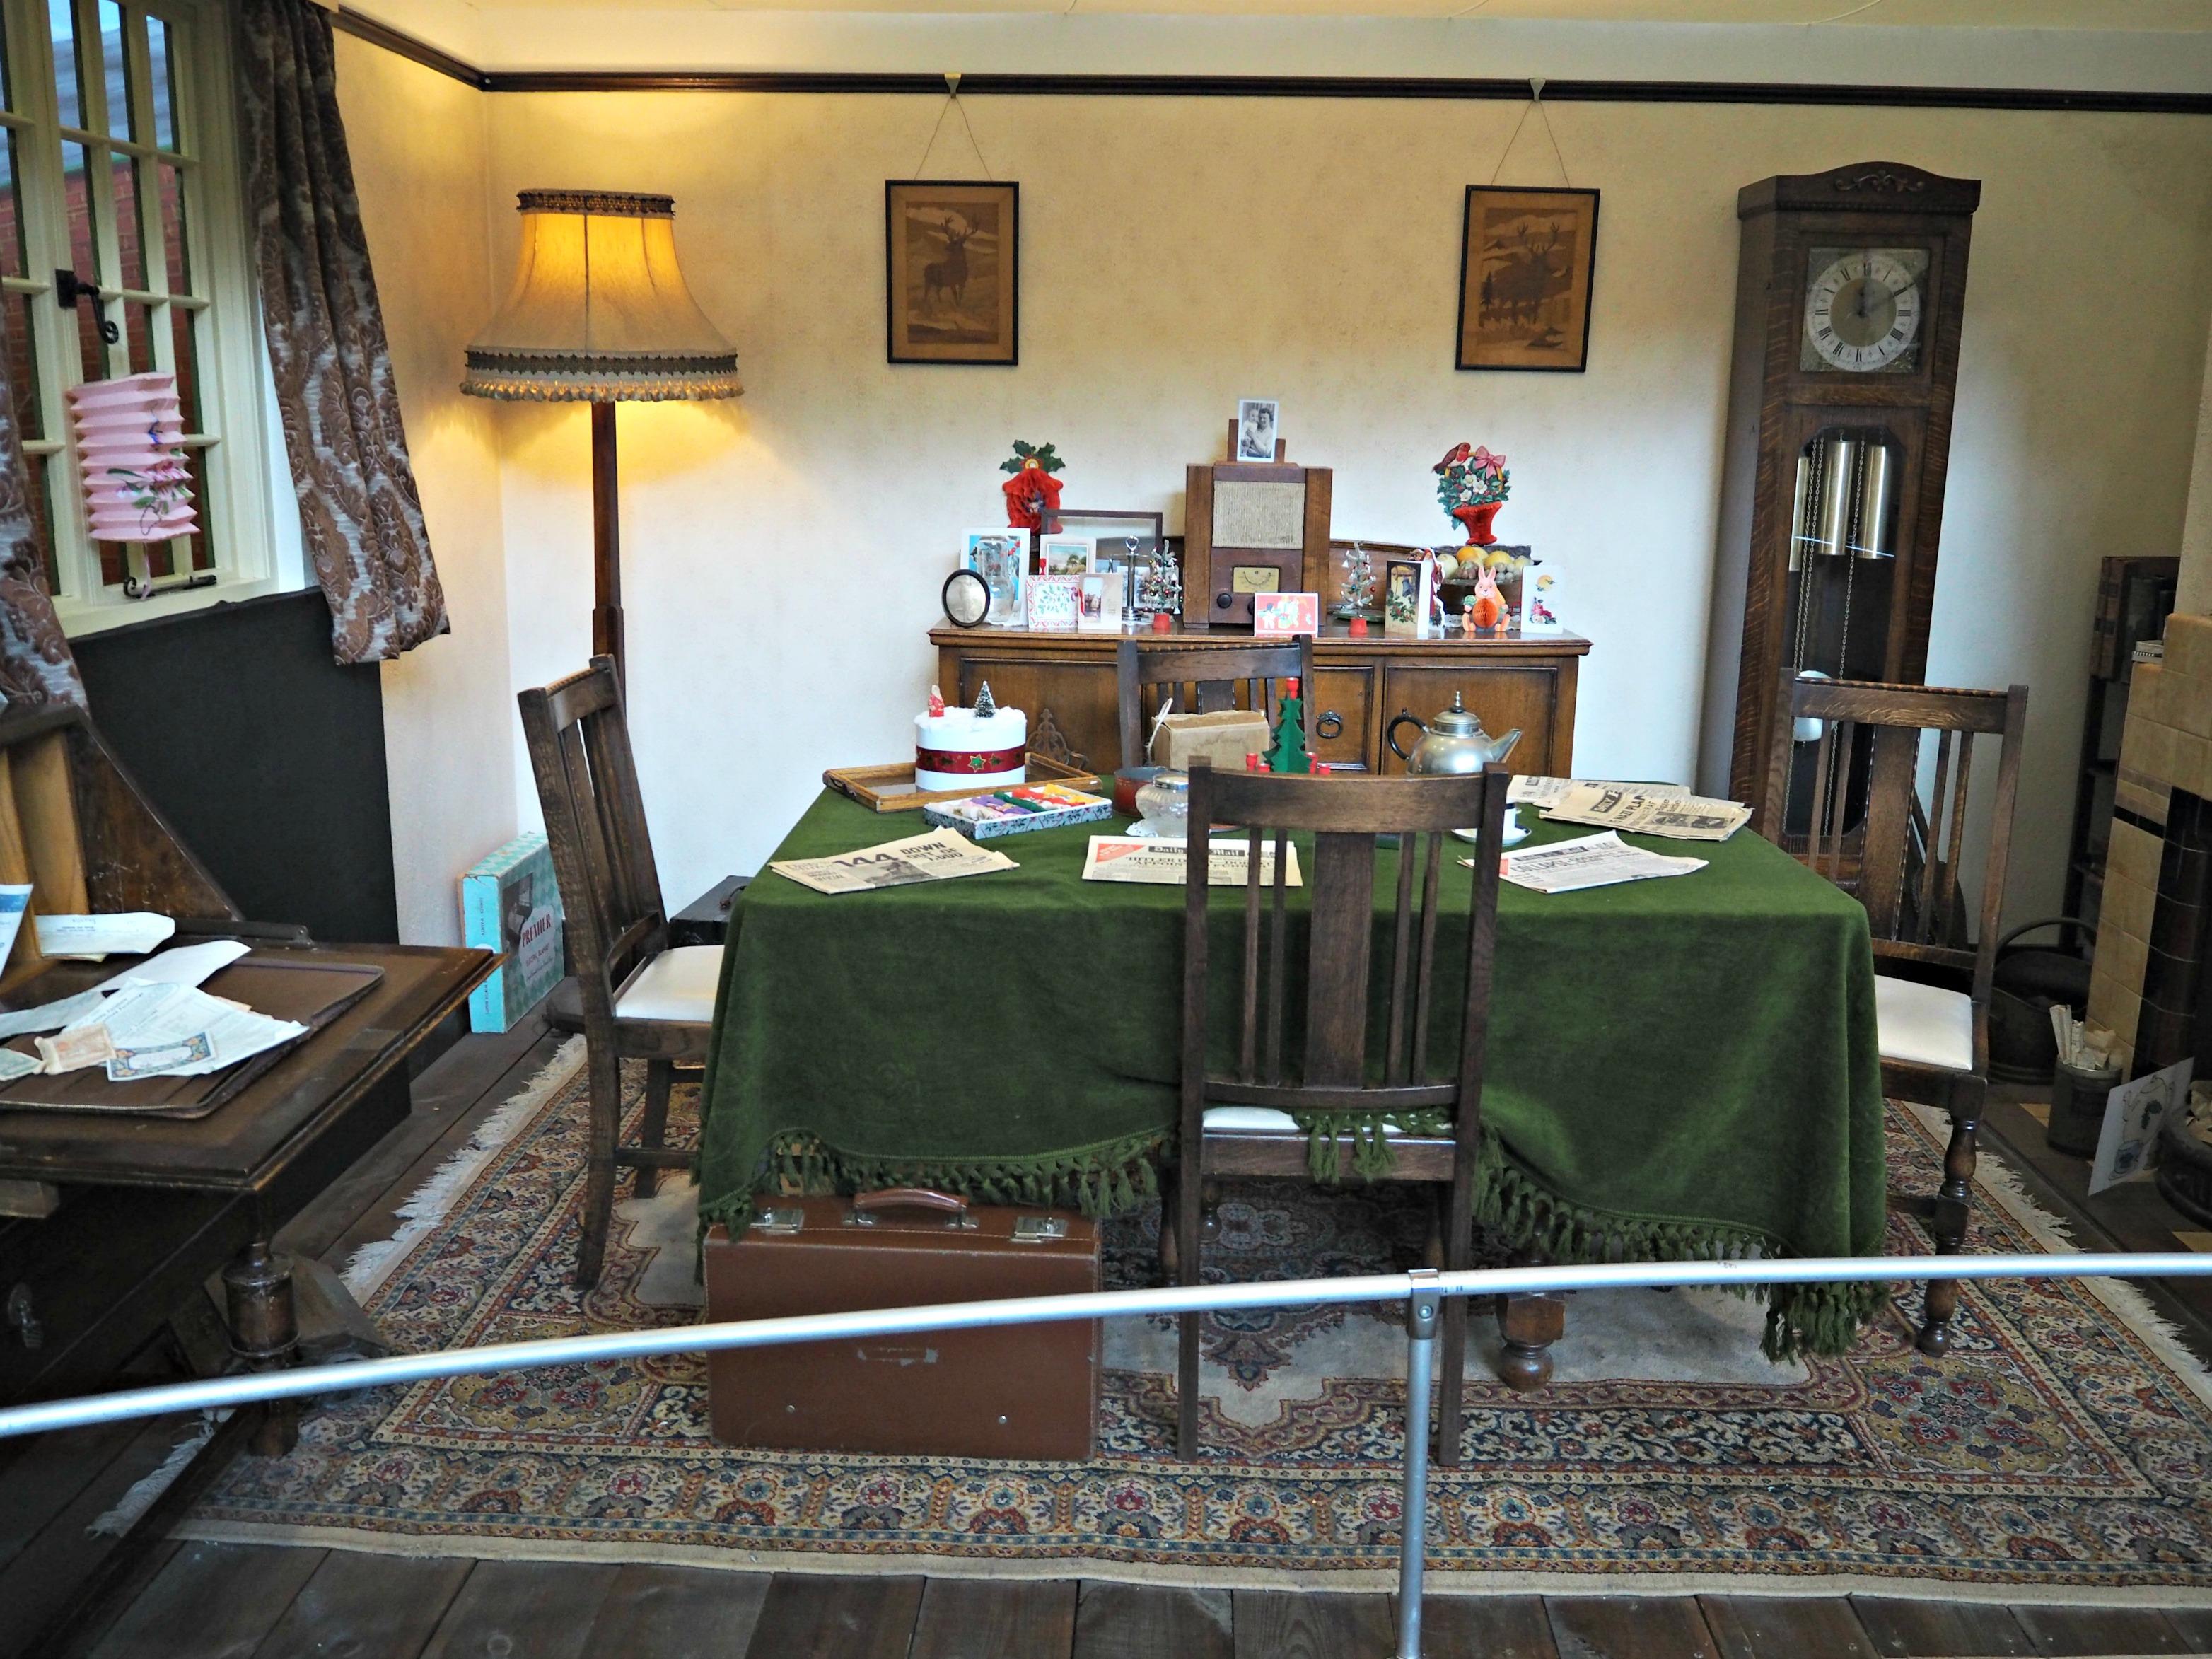 Milestones Museum Review 1940s room